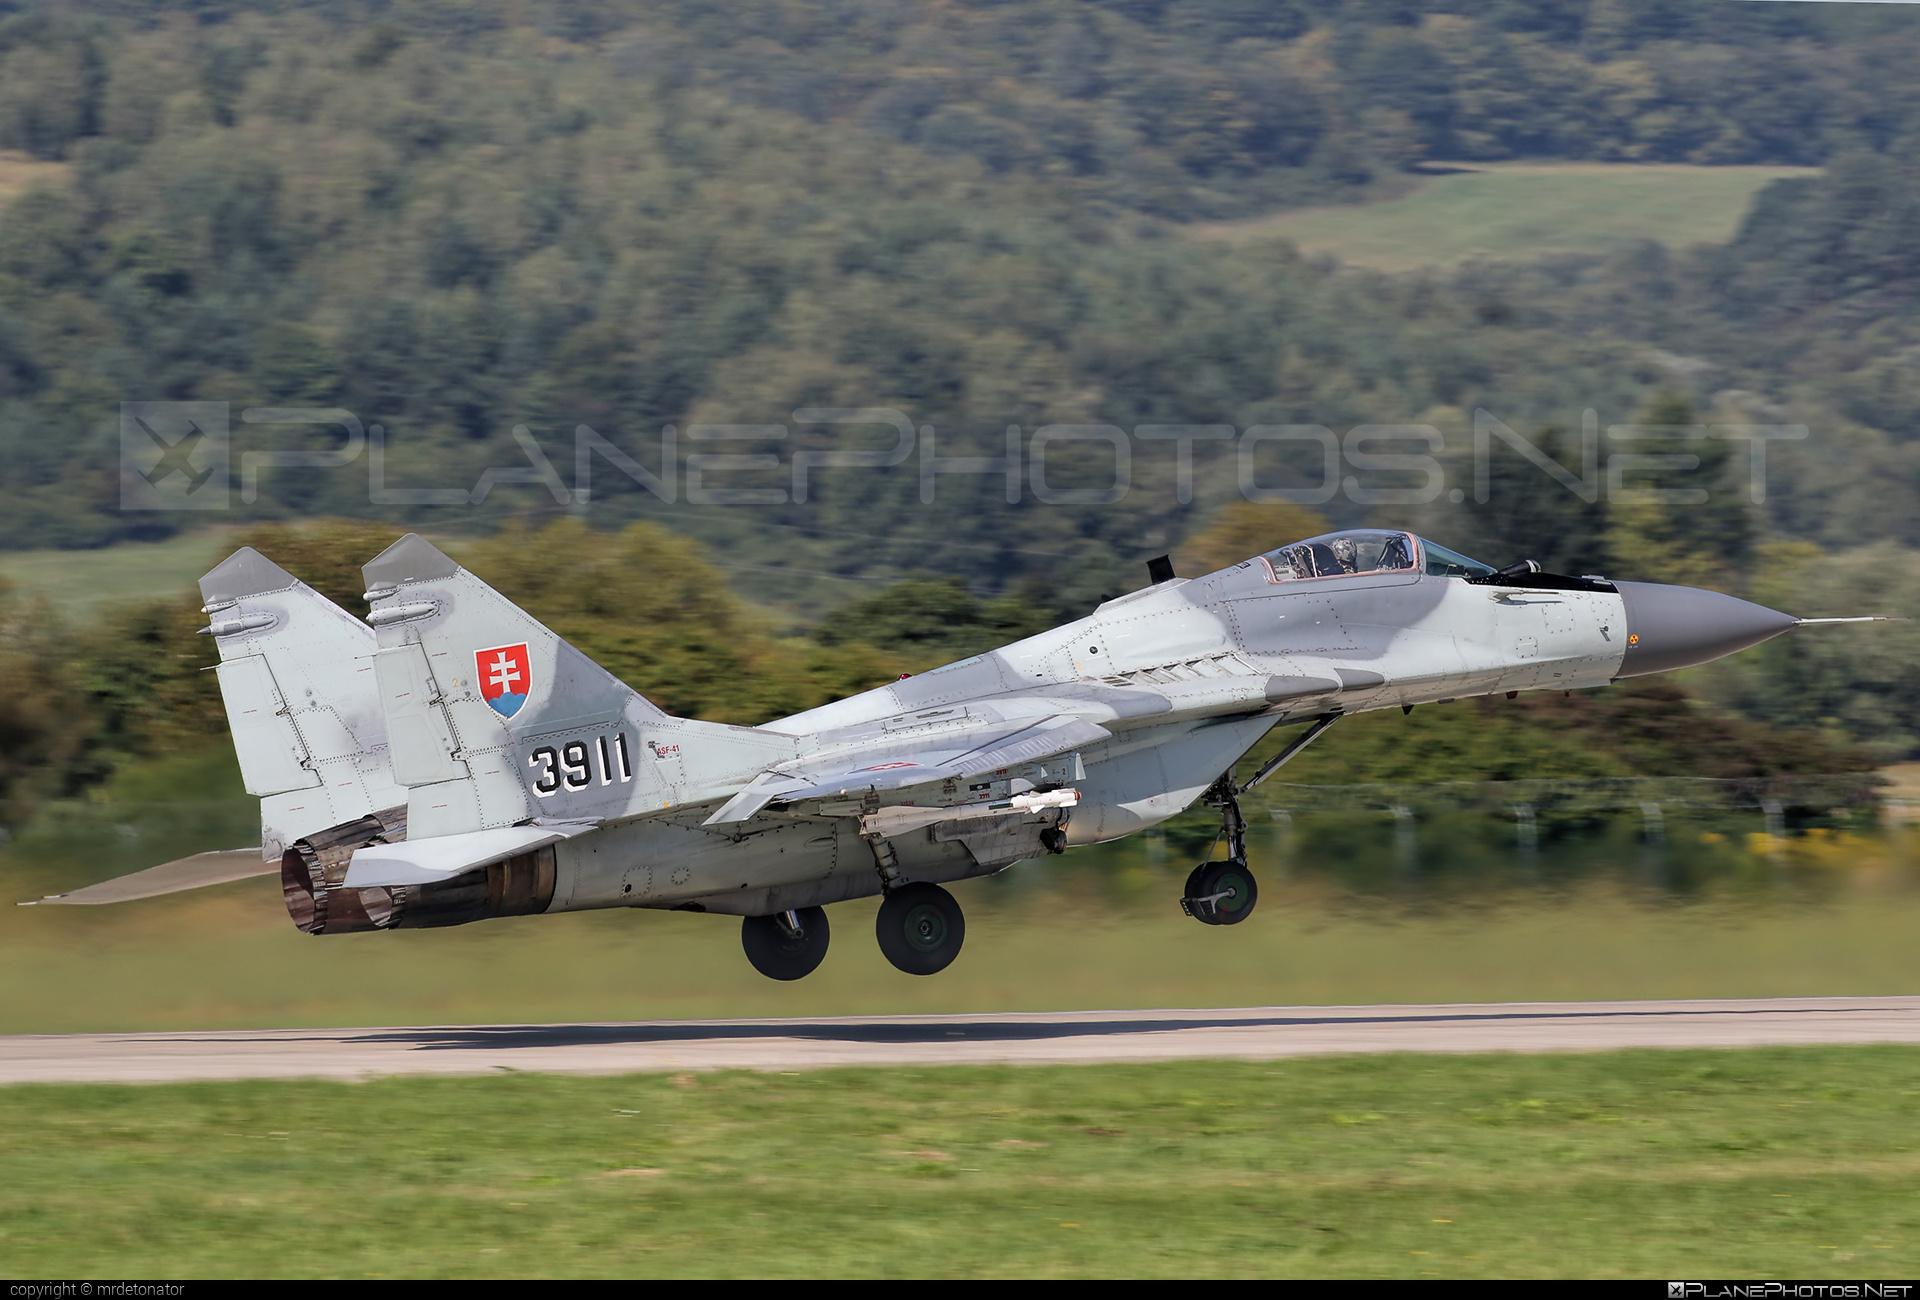 Mikoyan-Gurevich MiG-29AS - 3911 operated by Vzdušné sily OS SR (Slovak Air Force) #mig #mig29 #mig29as #mikoyangurevich #slovakairforce #vzdusnesilyossr